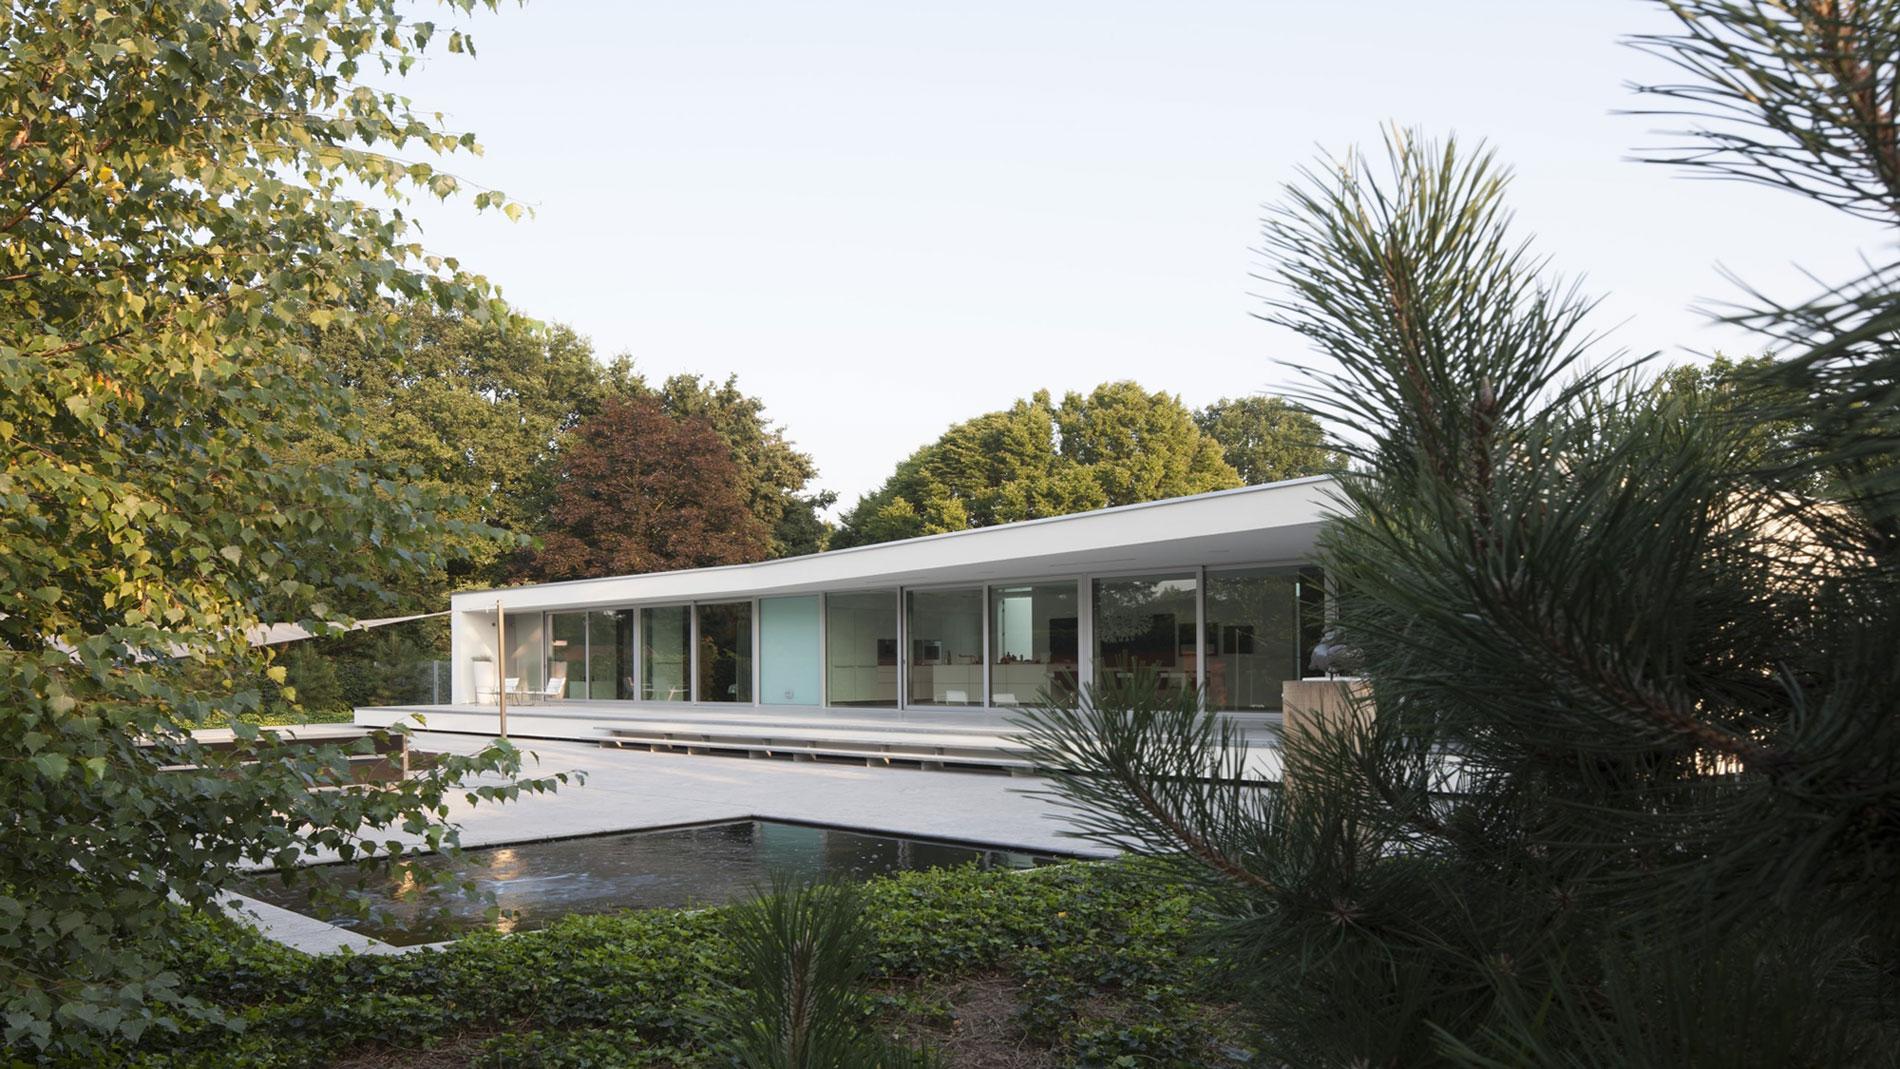 Boxed Villa Spee Haelen with Panoramic Windows by Lab32 architecten-10